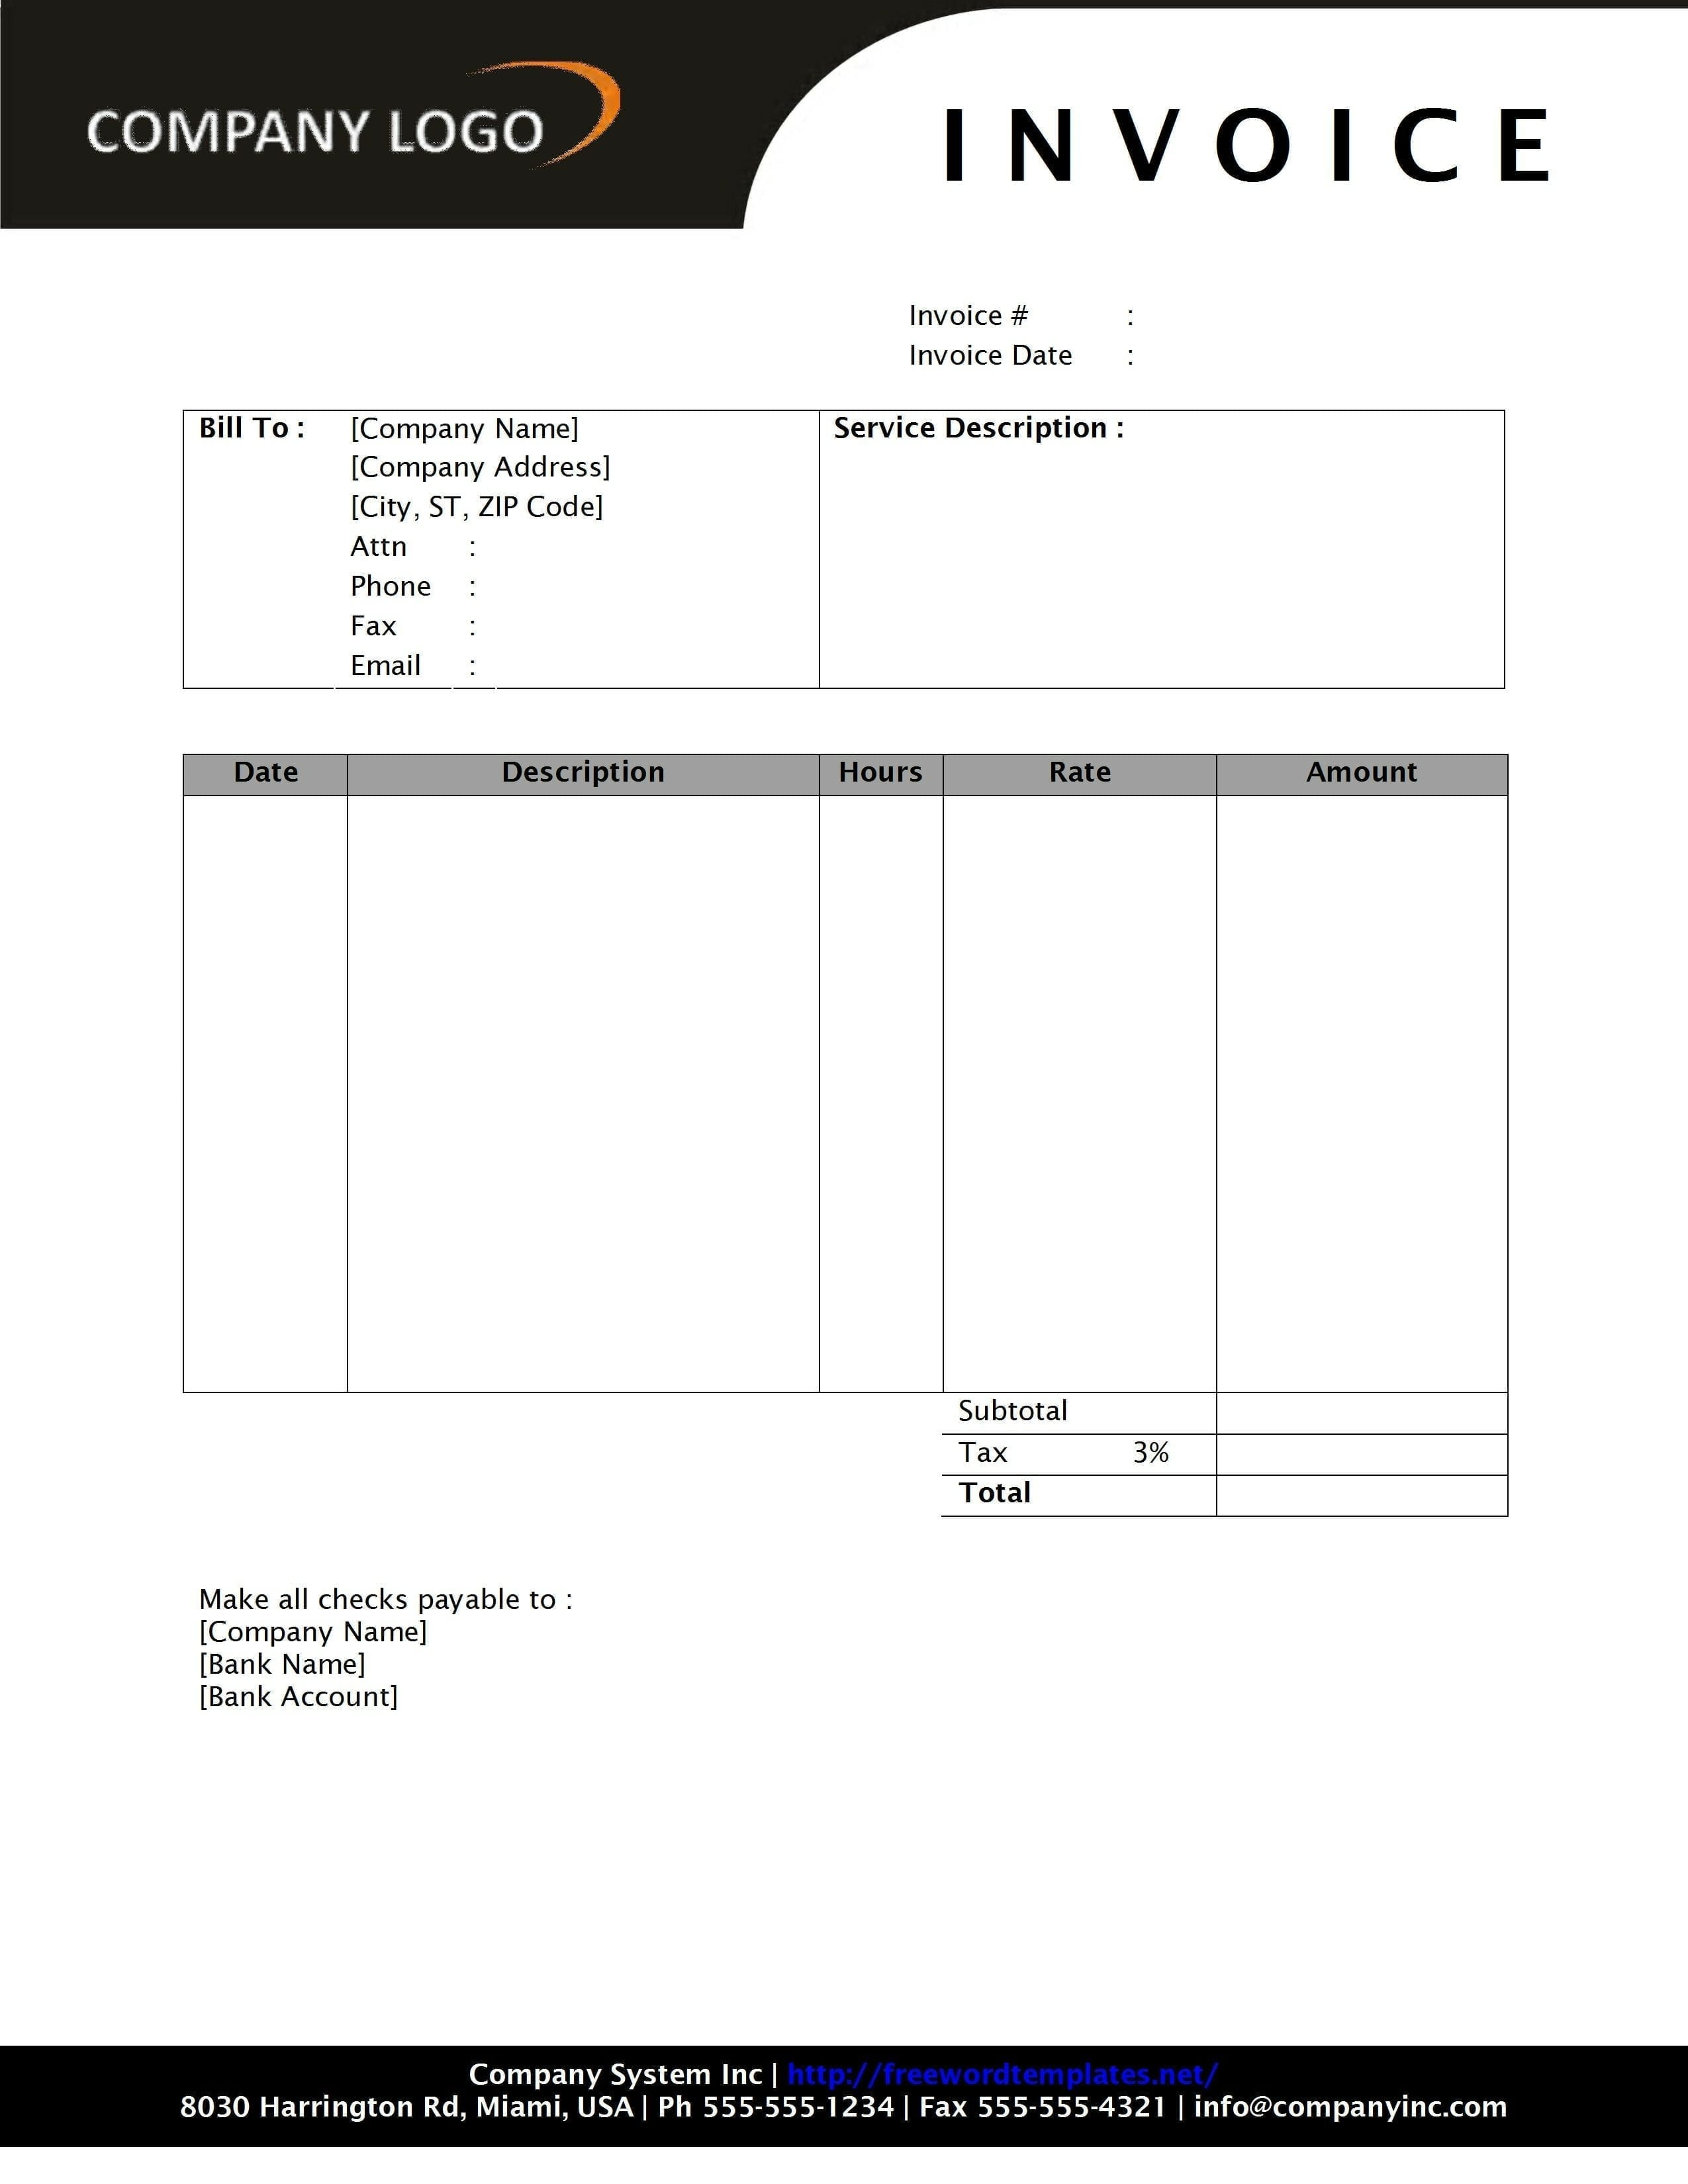 Invoice Template Microsoft Word 2010 Invoice Template Microsoft Word Spreadsheet Templates for Busines Spreadsheet Templates for Busines Simple Invoice Template Microsoft Word